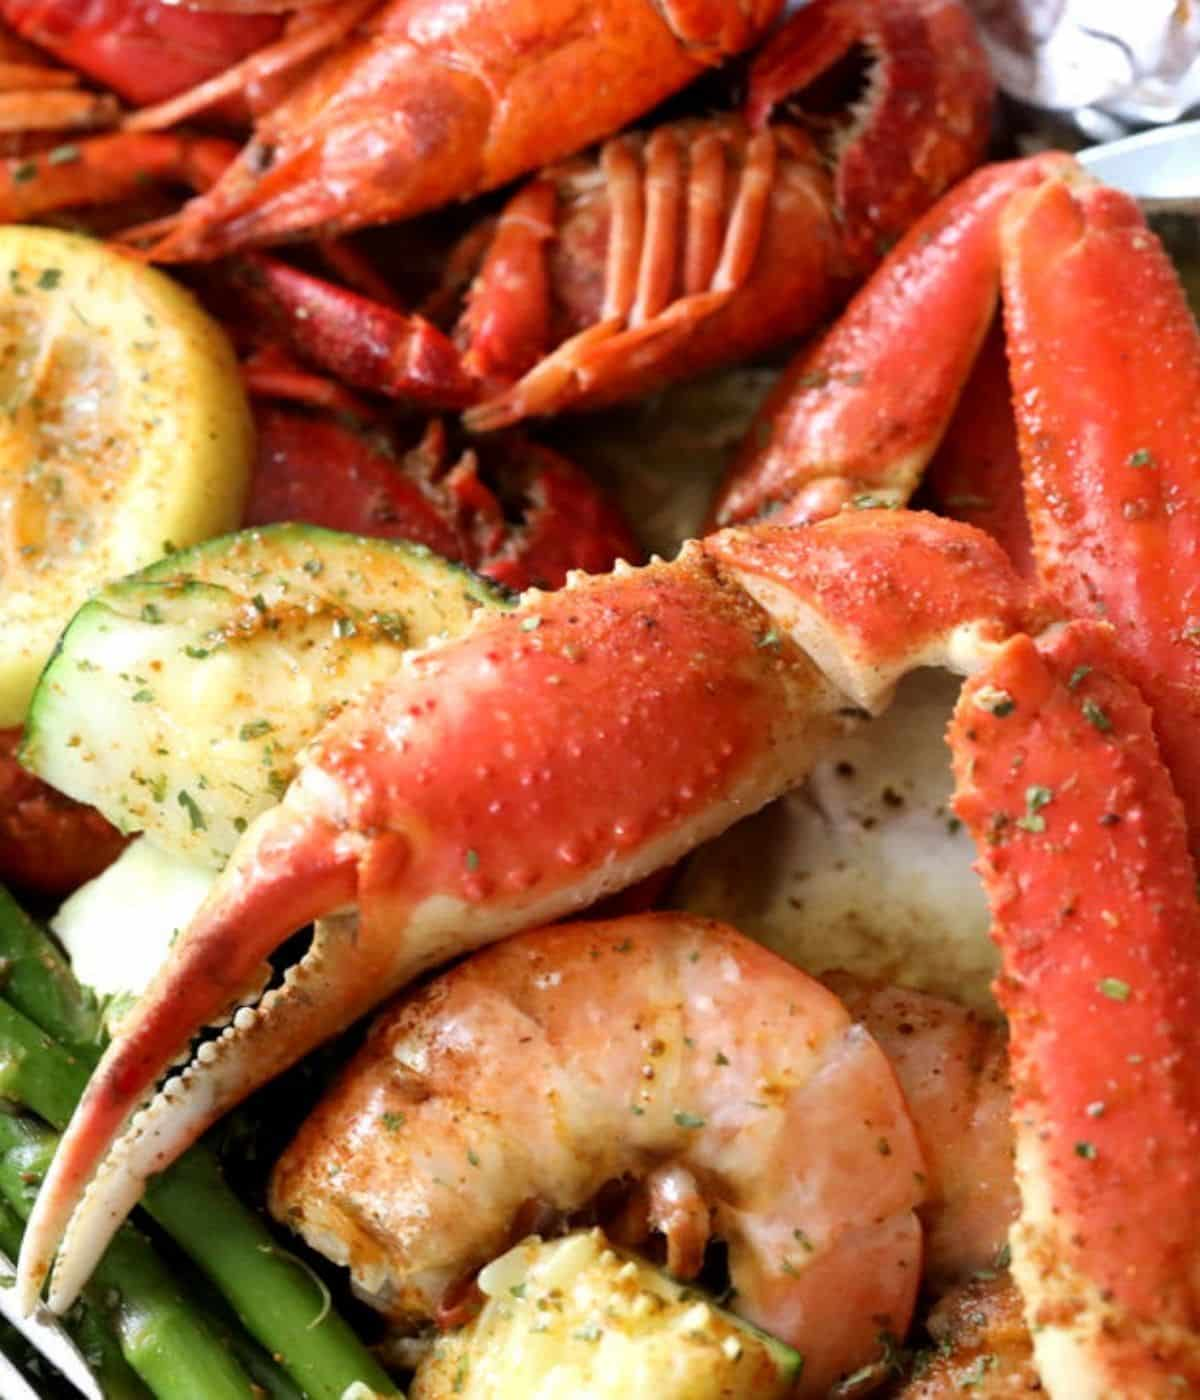 crab claw with shrimp and cajun zucchini squash